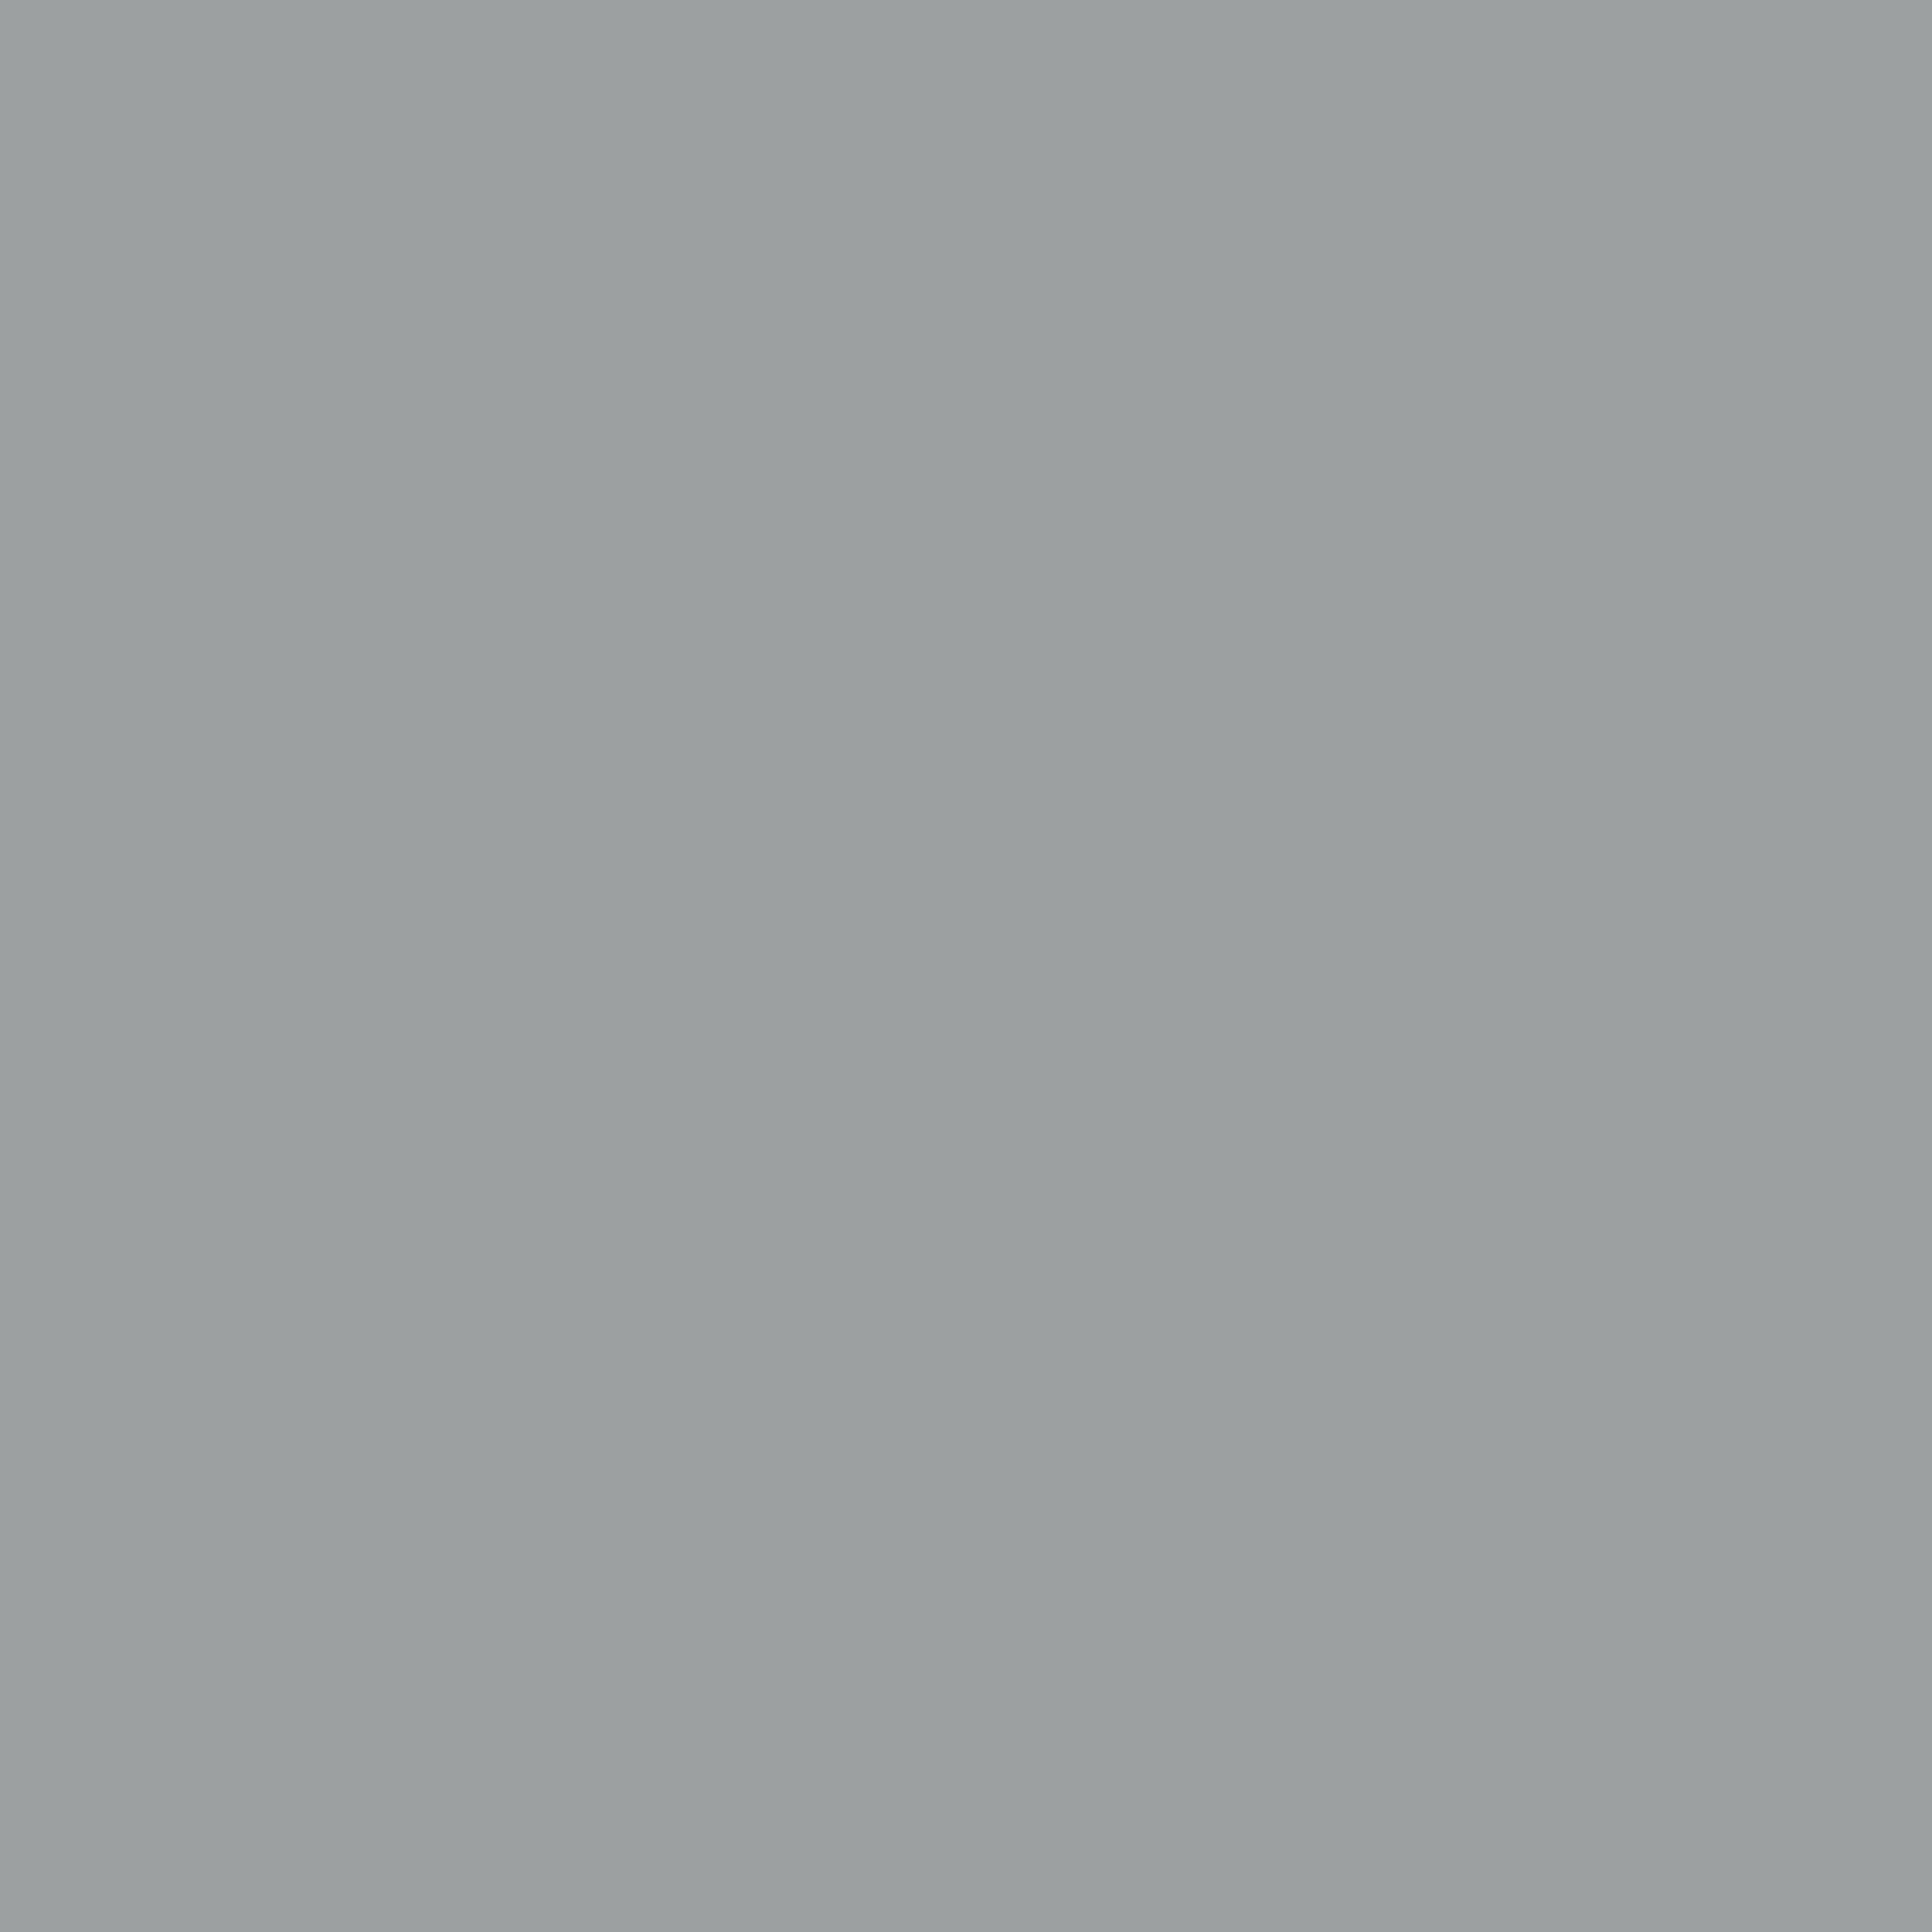 Slate grey stripes